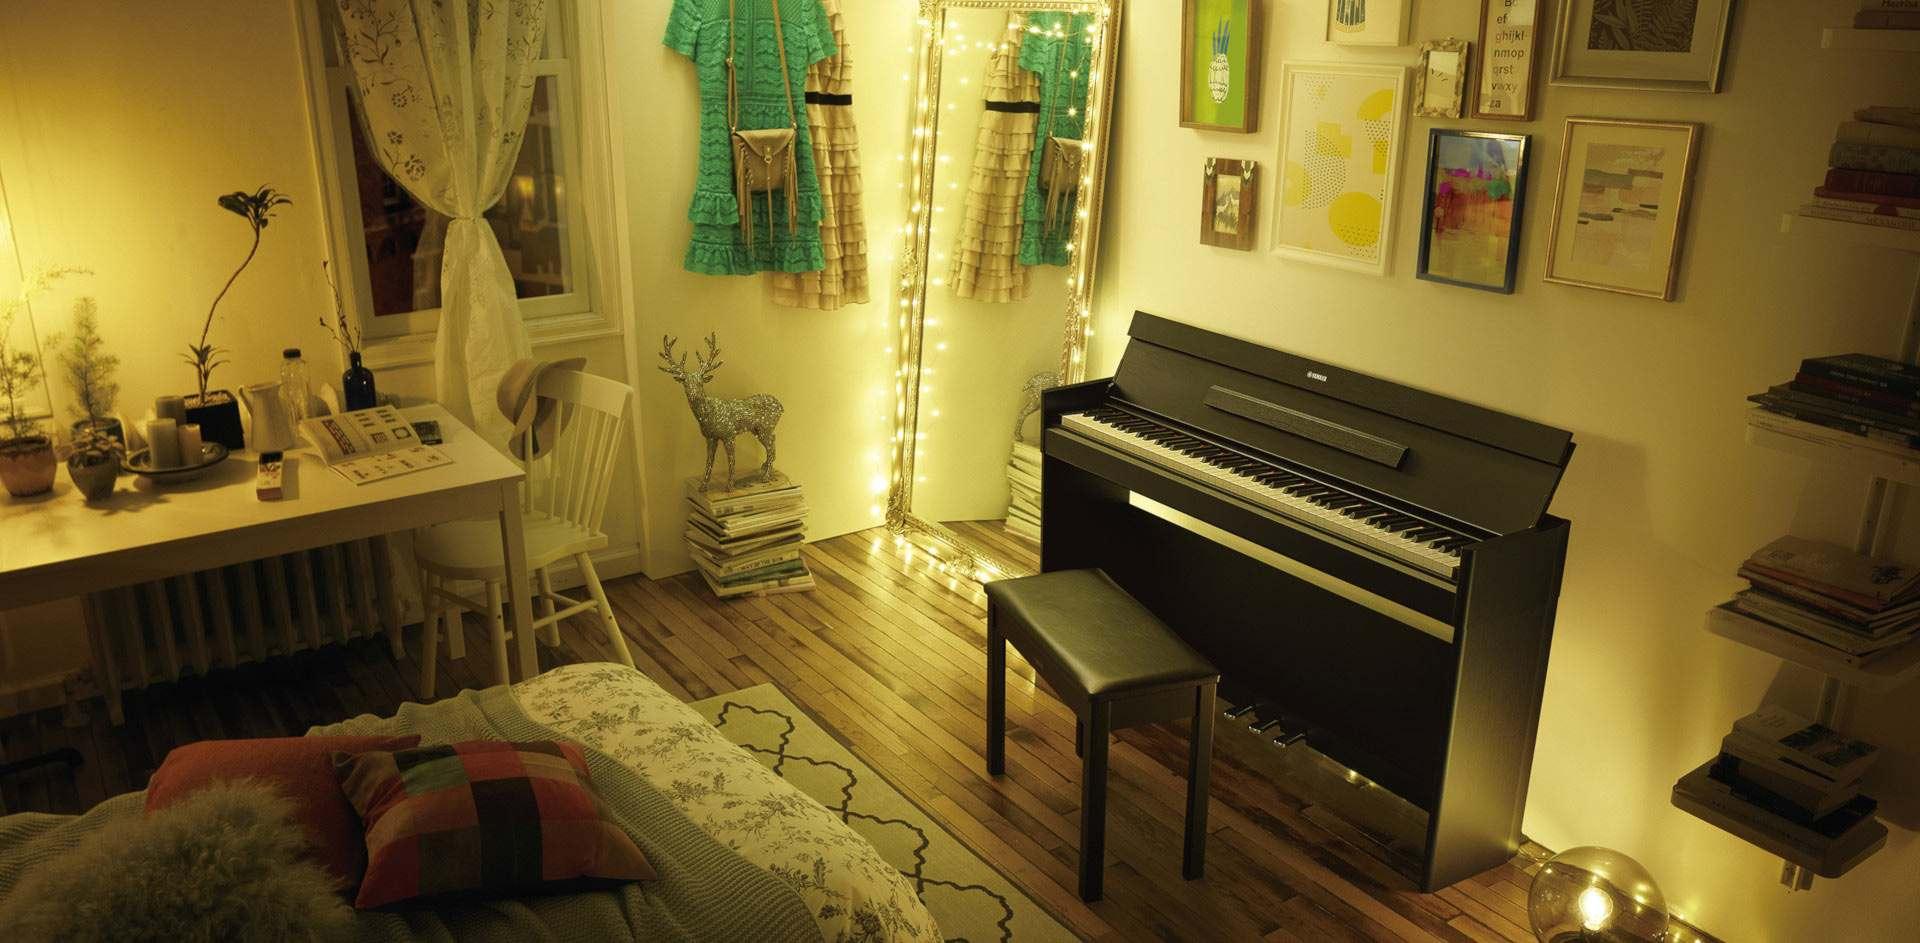 dan-piano-dien-yamaha-nao-tot-cho-nguoi-moi-hoc-2